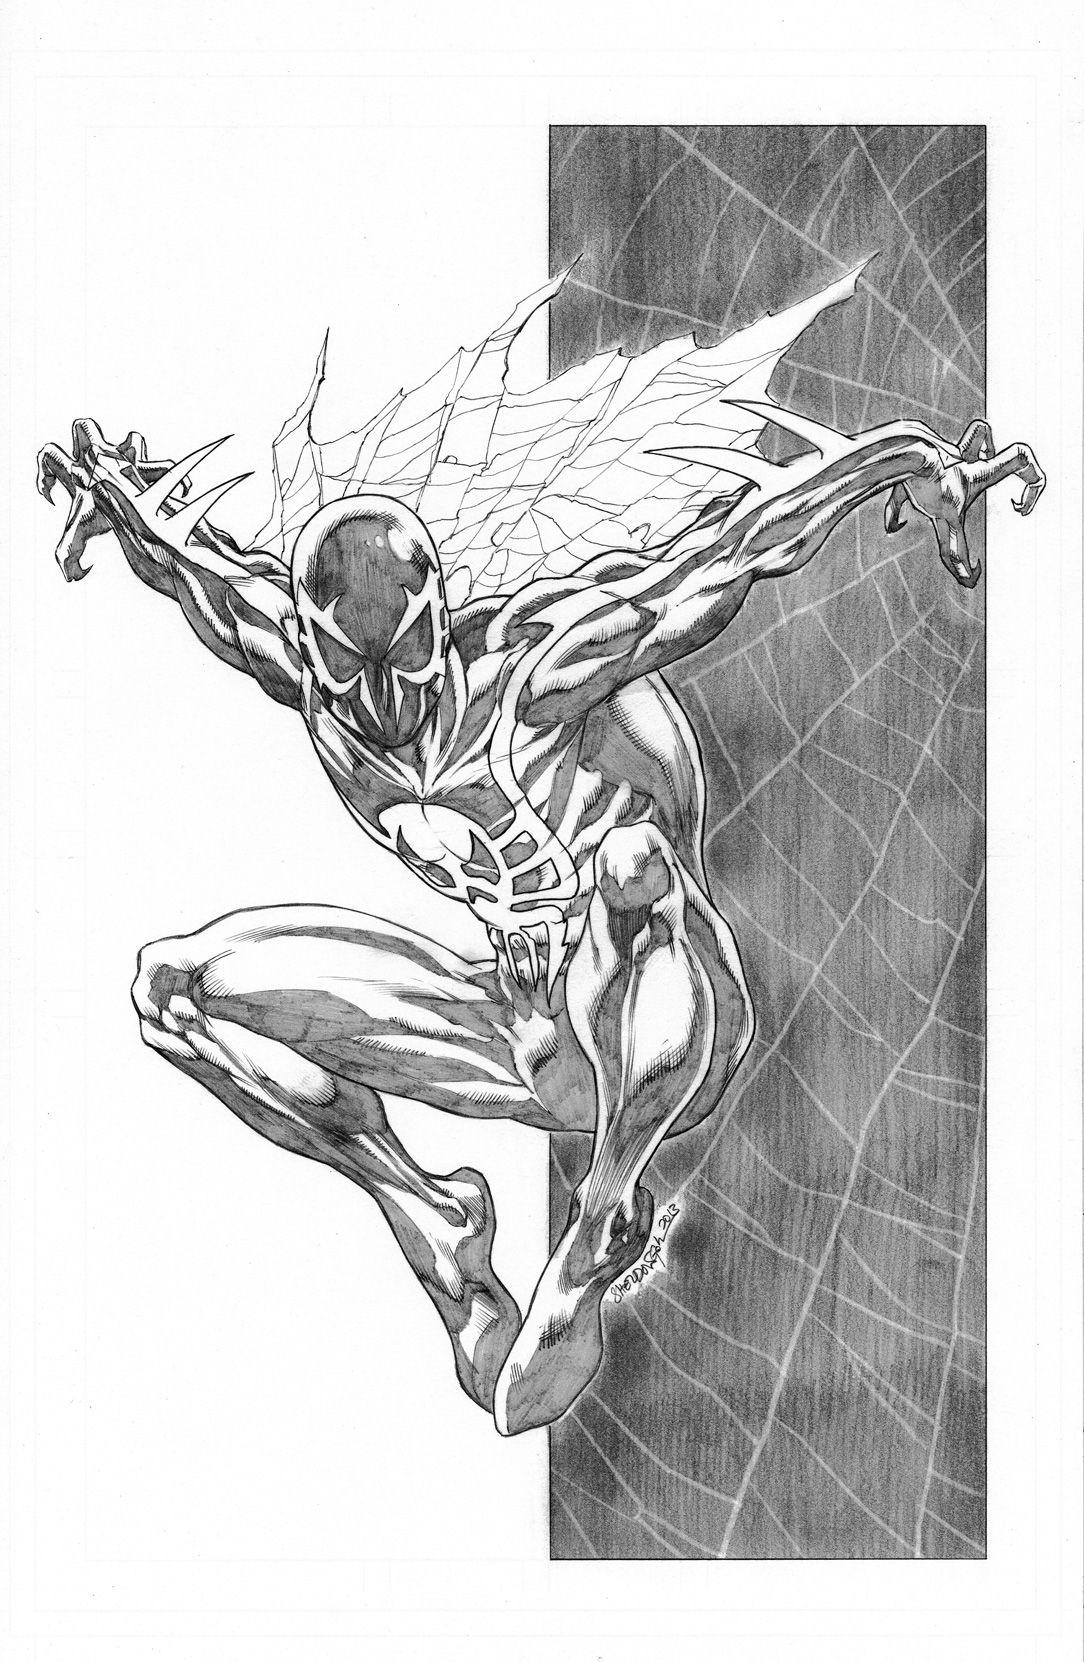 Spider Men Series Spider Man 2099 By Sheldongoh On Deviantart Spiderman Drawing Spiderman Art Marvel Drawings